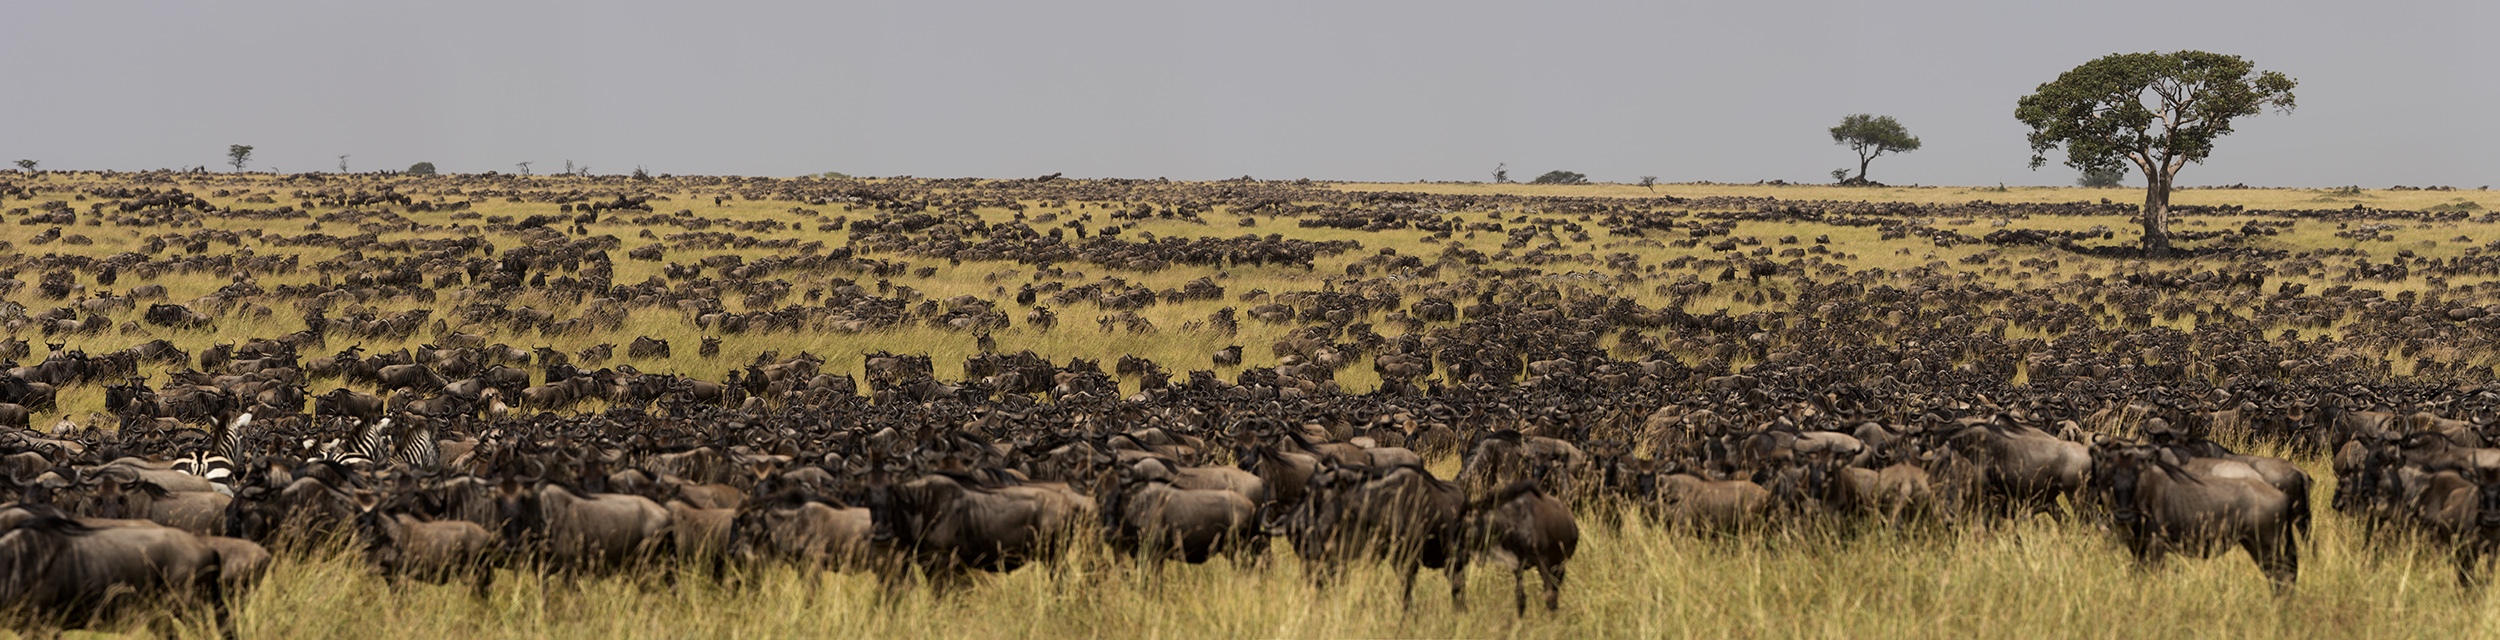 Wildebeest herd during the great migration in the Maasai Mara